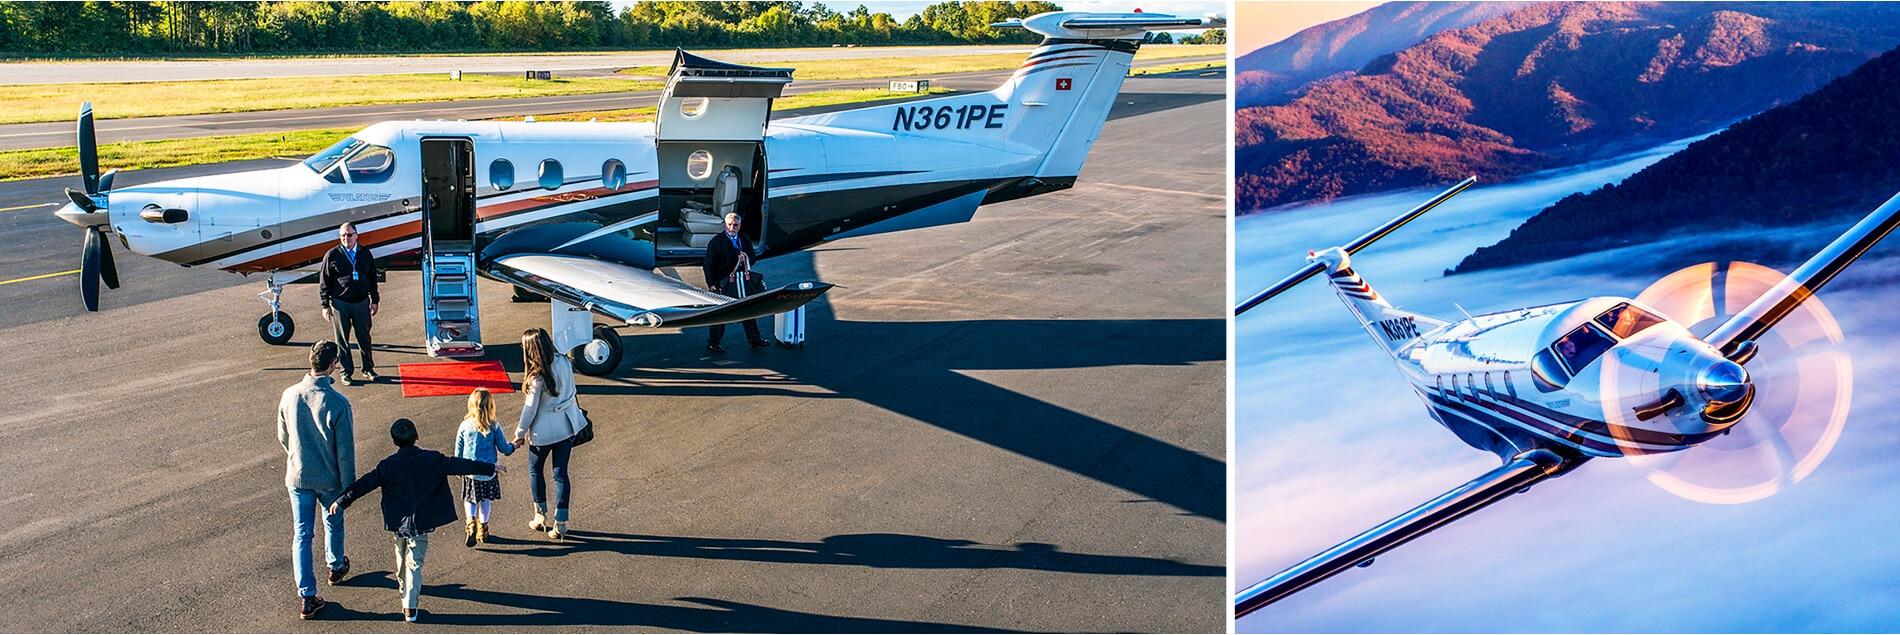 Family Boarding A Pilatus PC-12